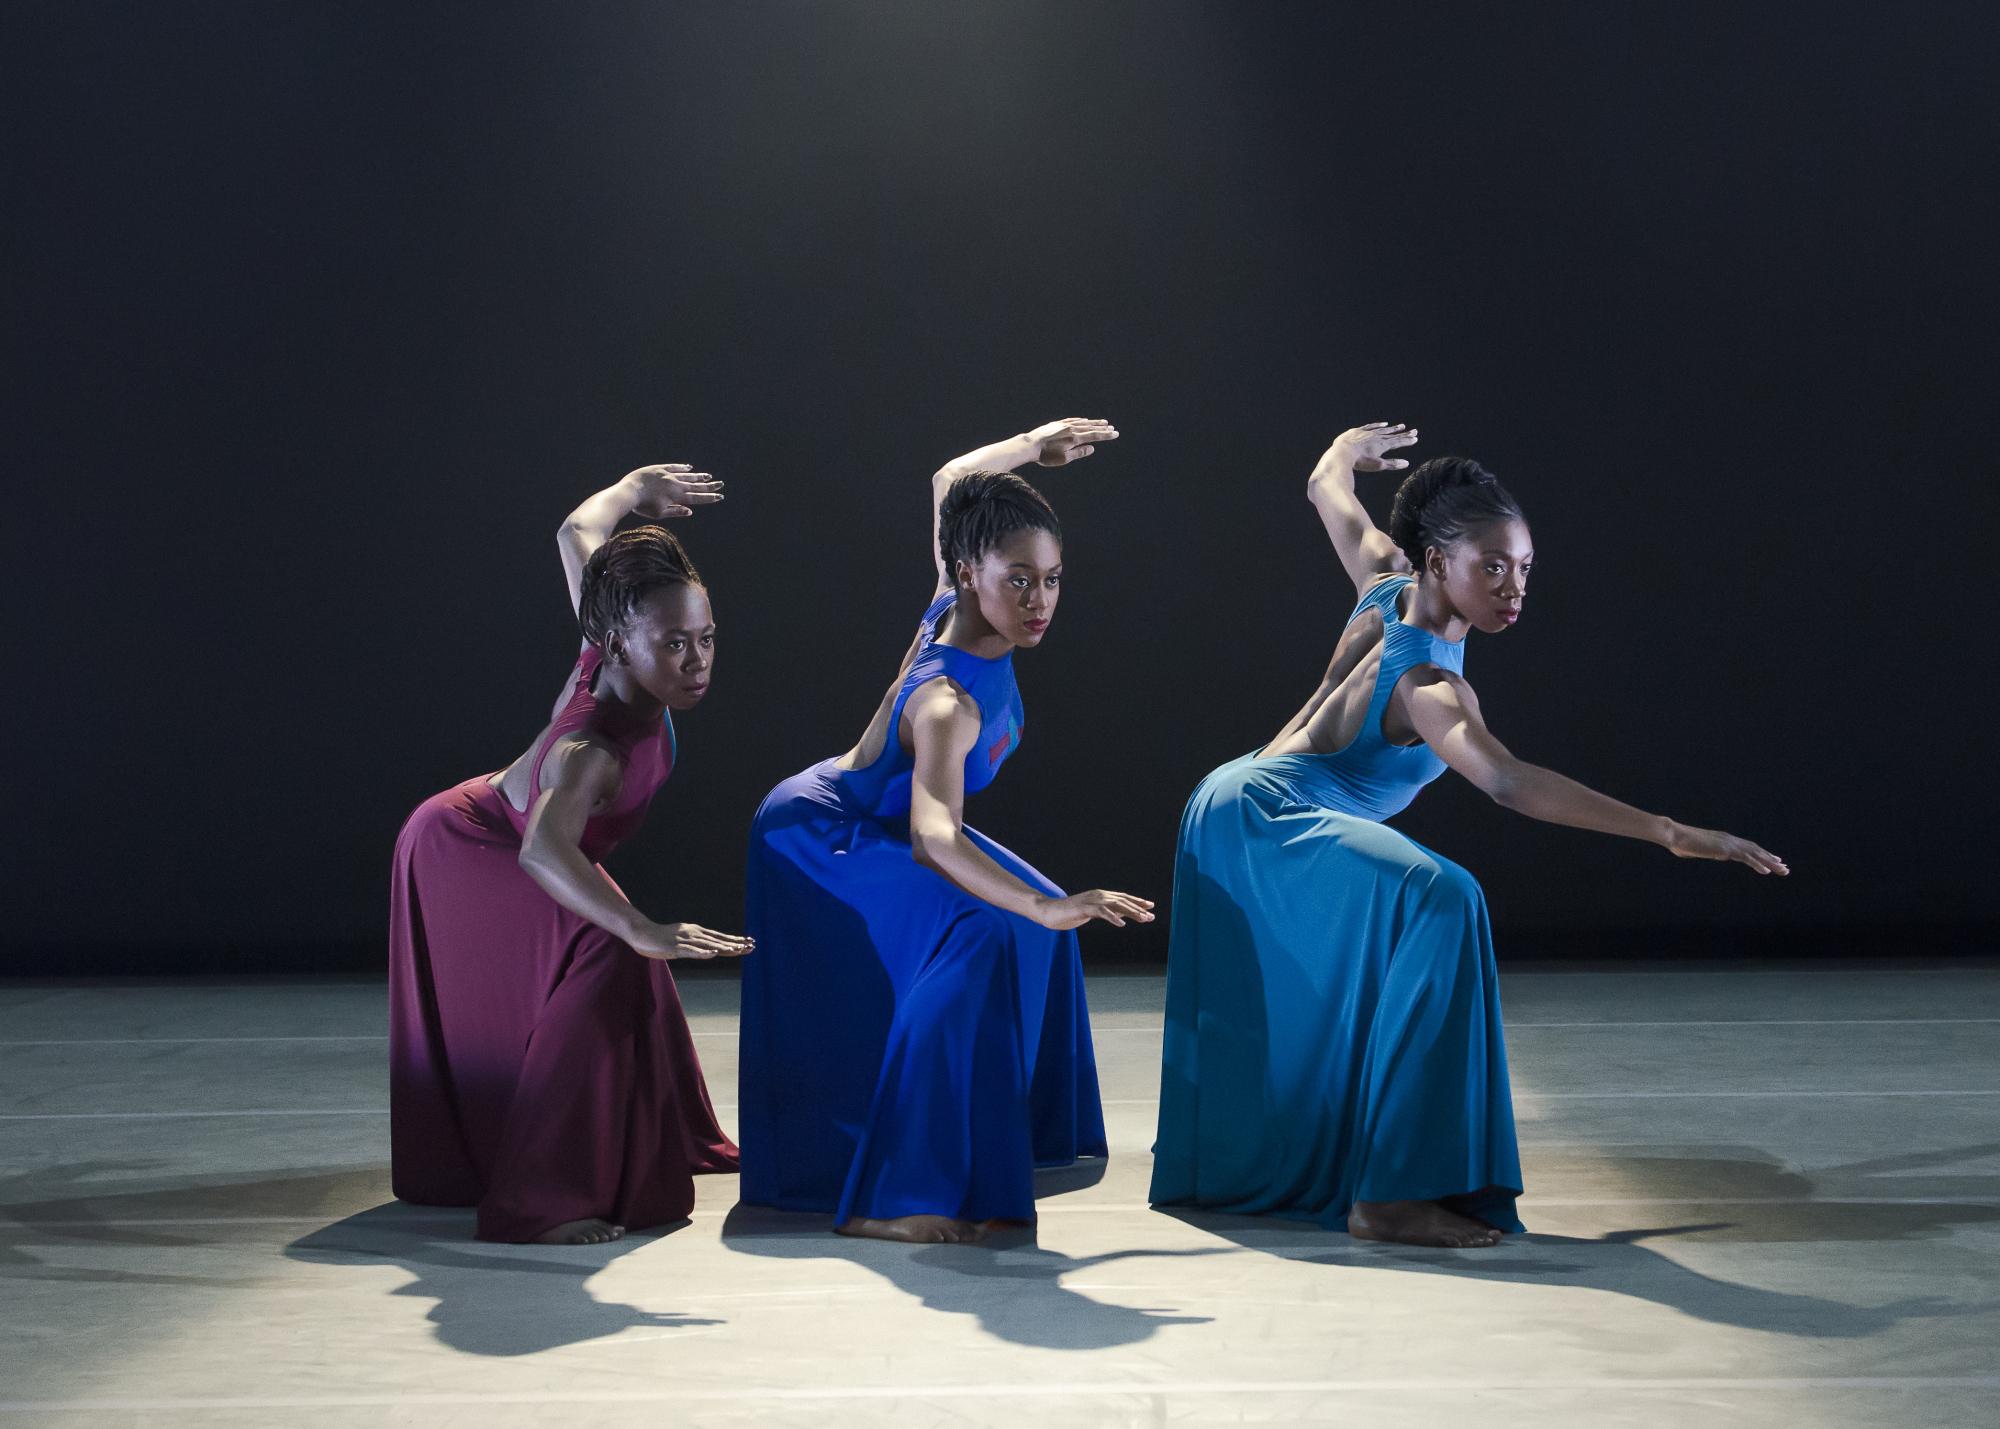 Ailey, Ailey II, African American Dance, Black Dance, Africa American Dance Theater, KOLUMN Magazine, KOLUMN, KINDR'D Magazine, KINDR'D